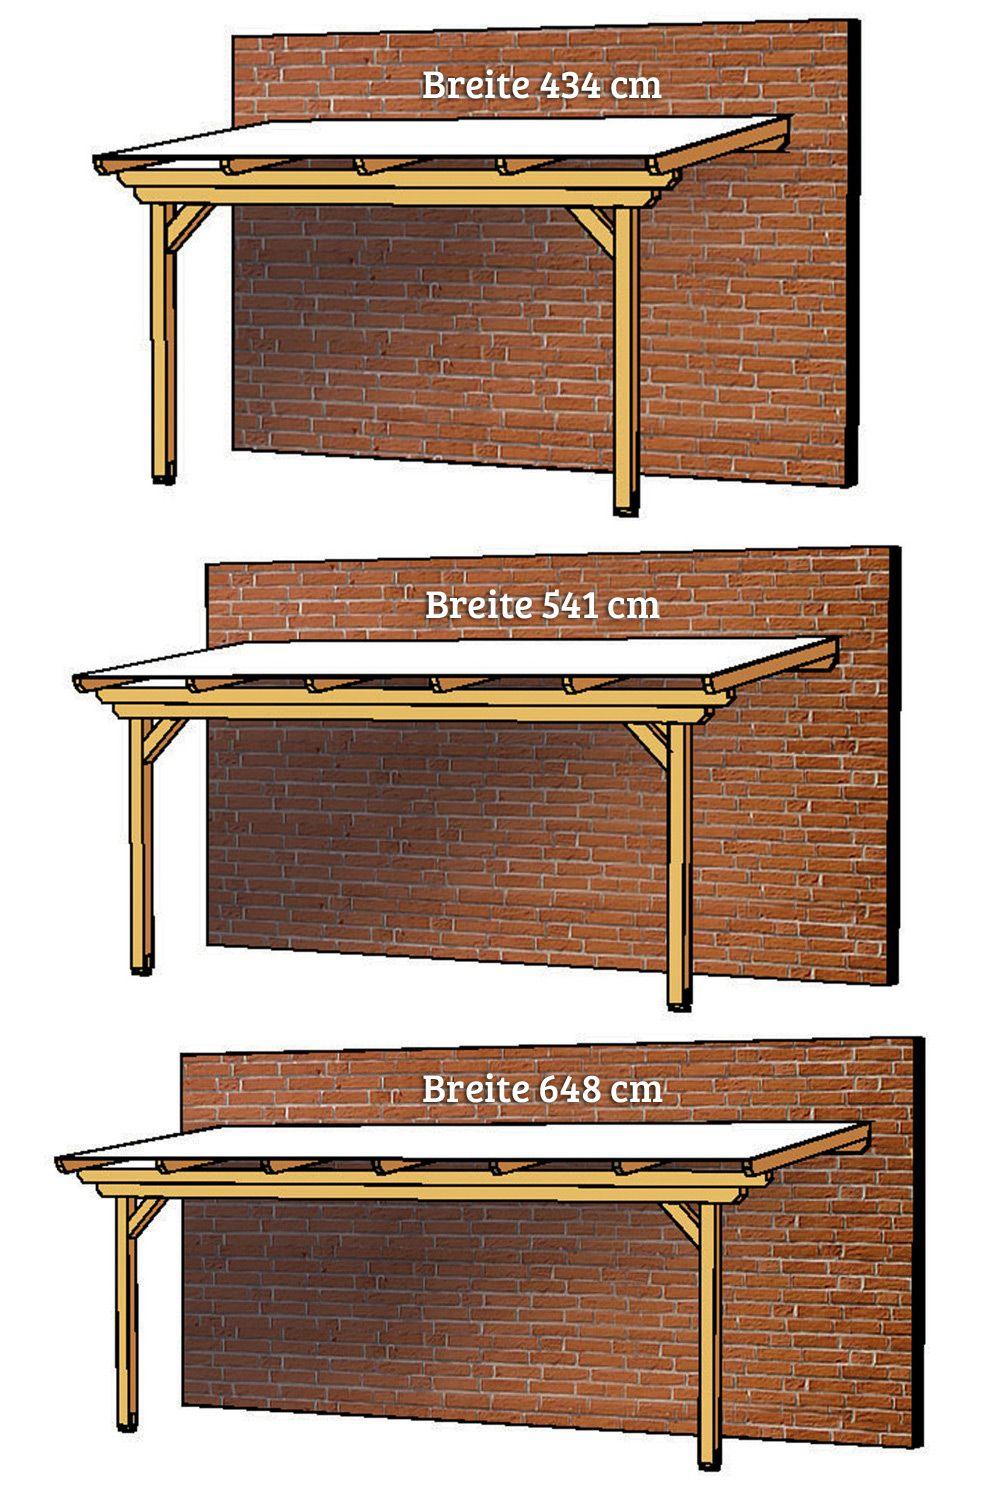 Terrassenüberdachung Holz-Bausatz SKANHOLZ «Ancona» Terrassendach | Terrassenüberdachung